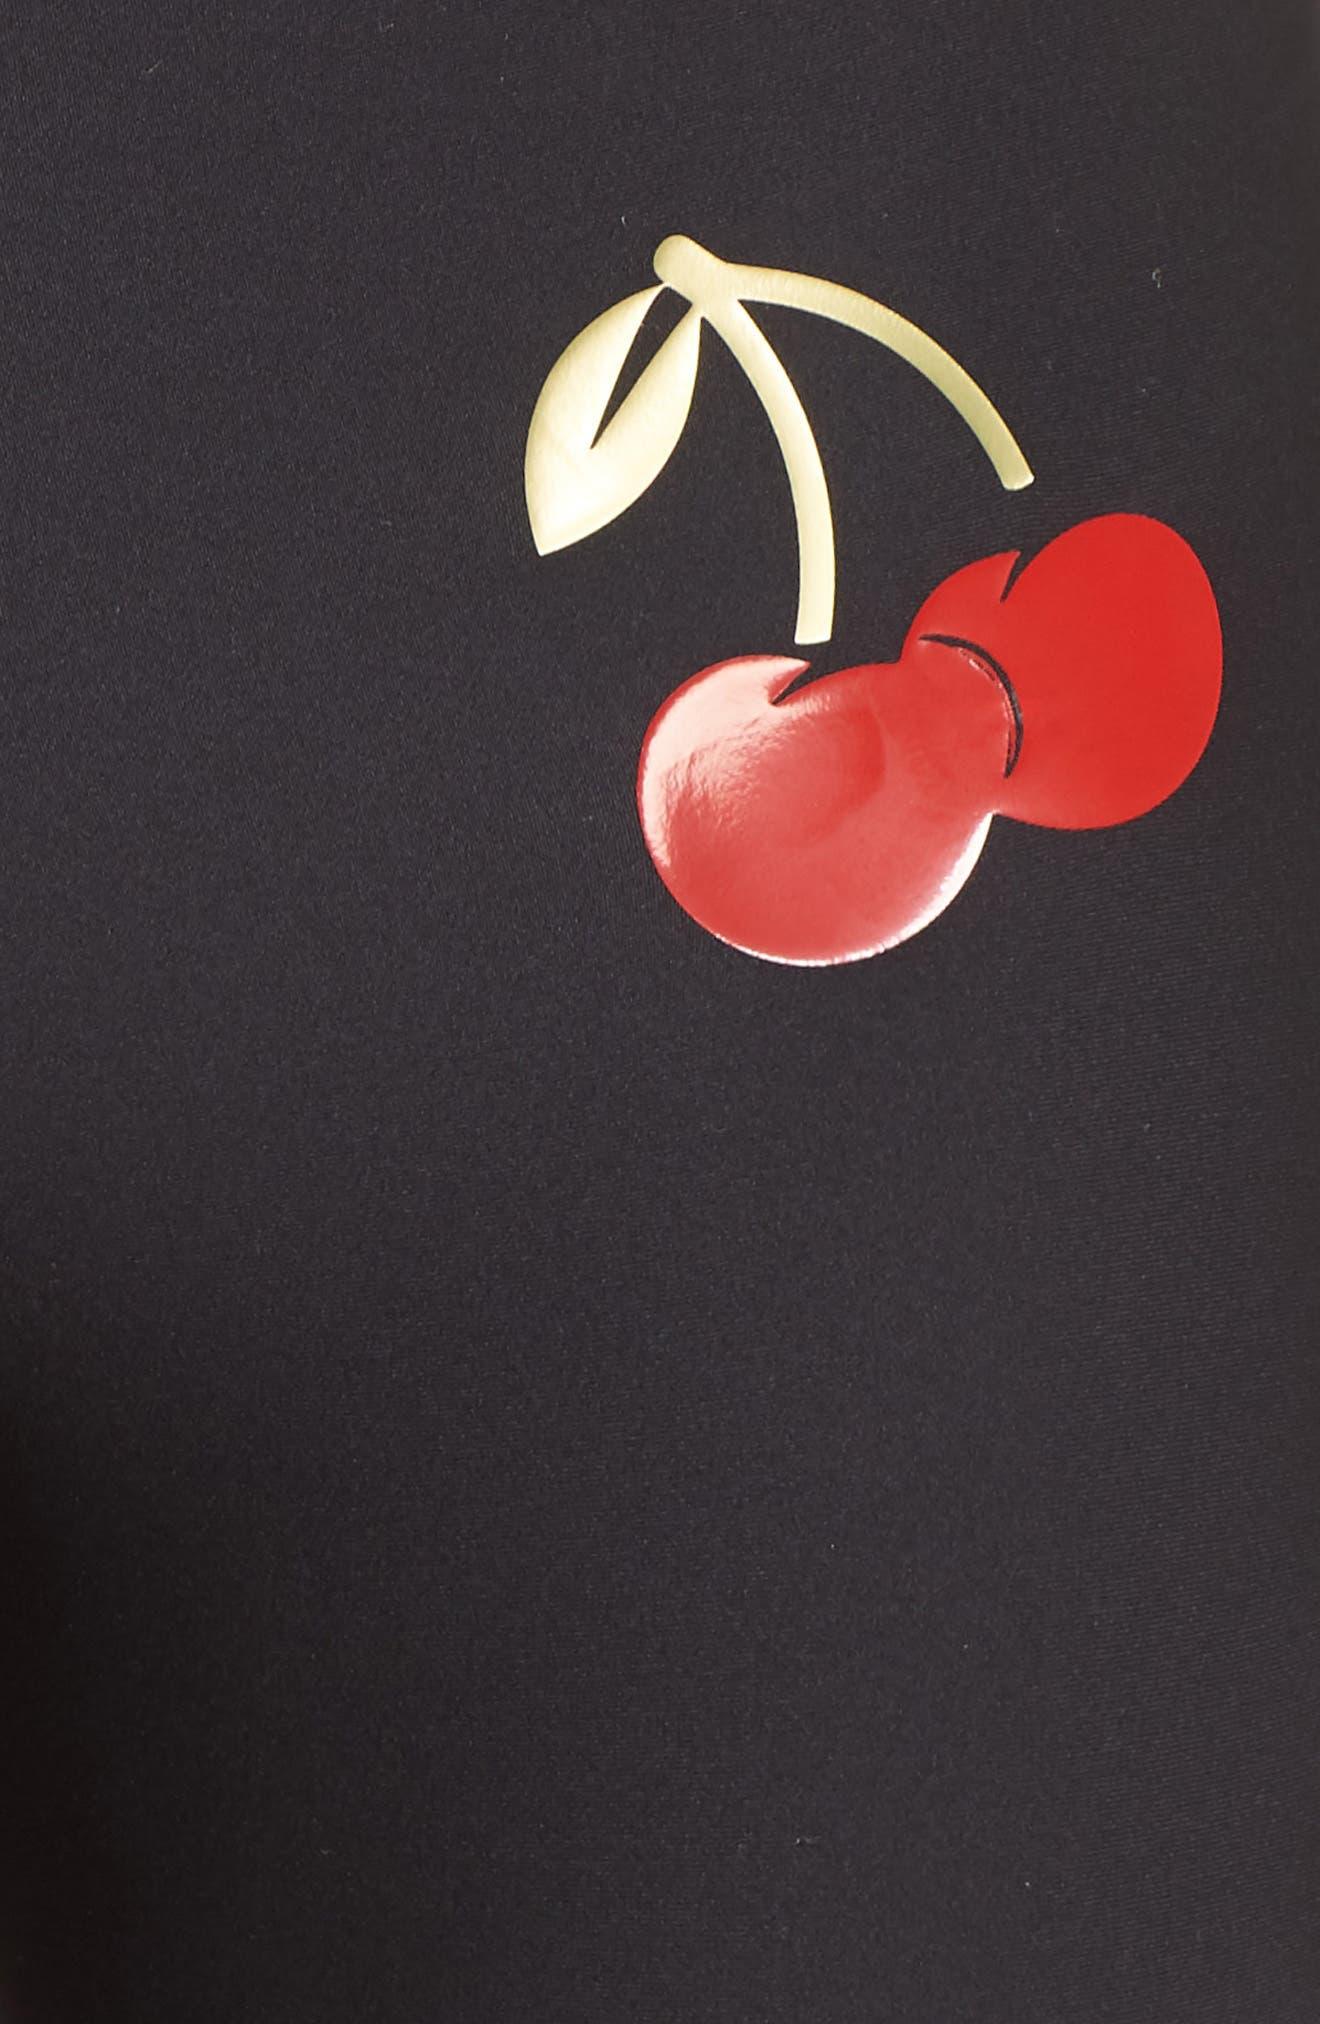 Ultra Cherry Pop Leggings,                             Alternate thumbnail 6, color,                             Nero/ Patent Rouge